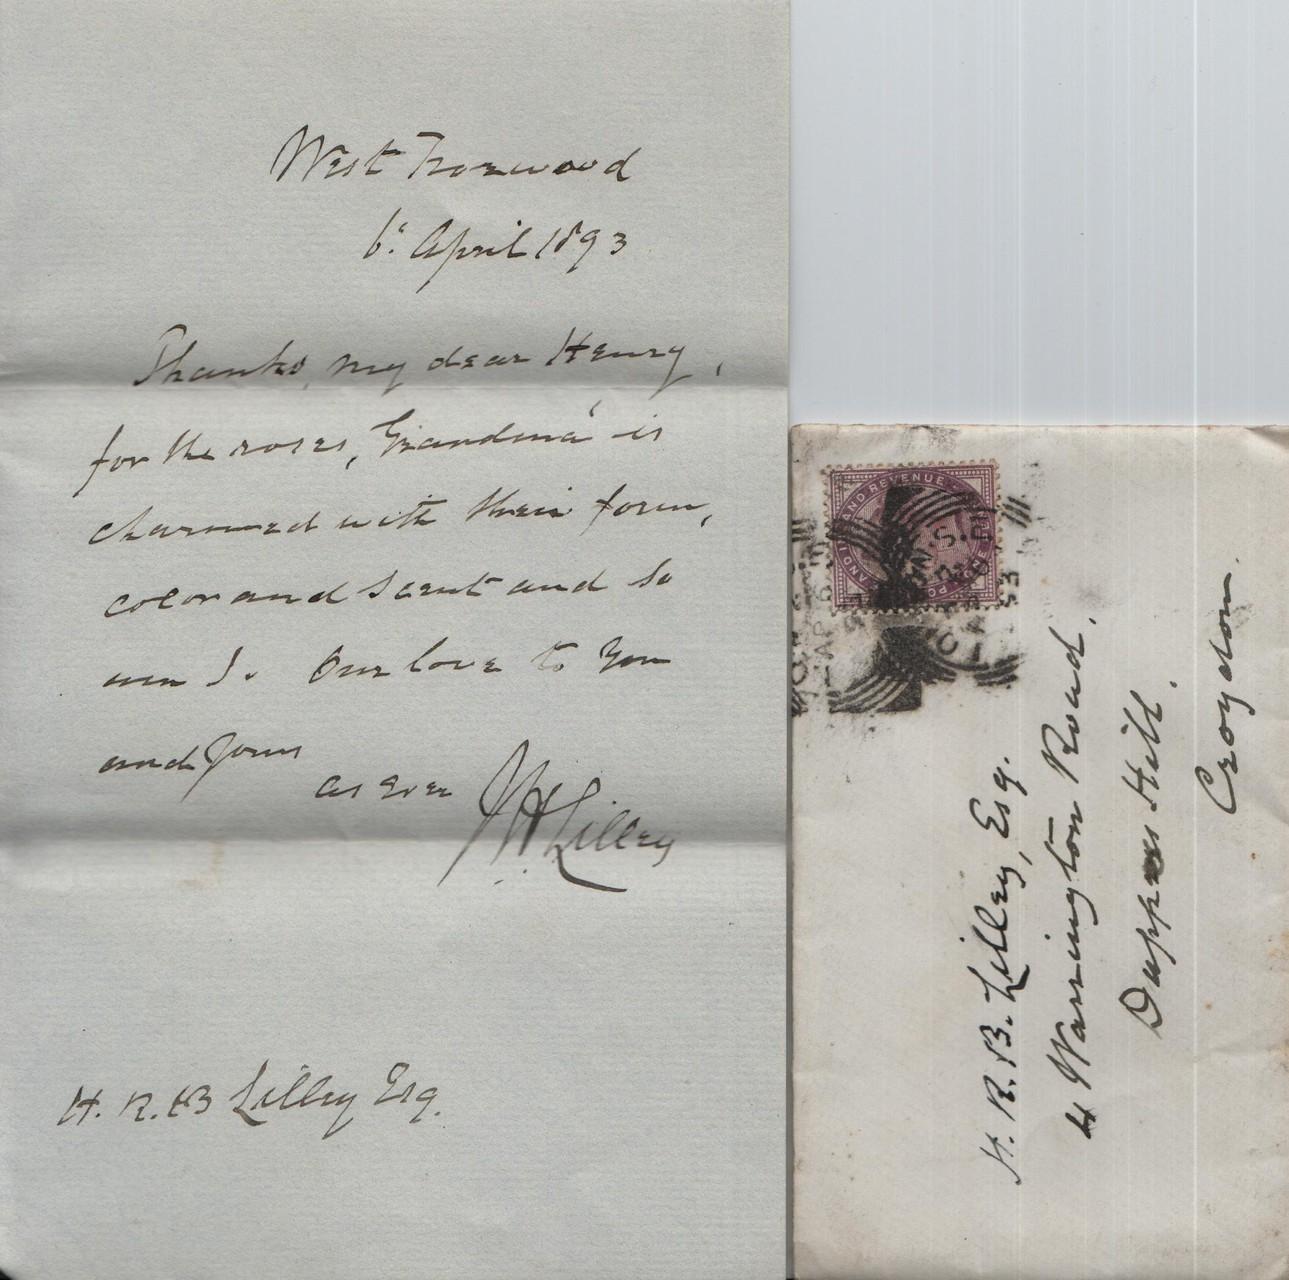 1893 April 6th JHL to HRBL